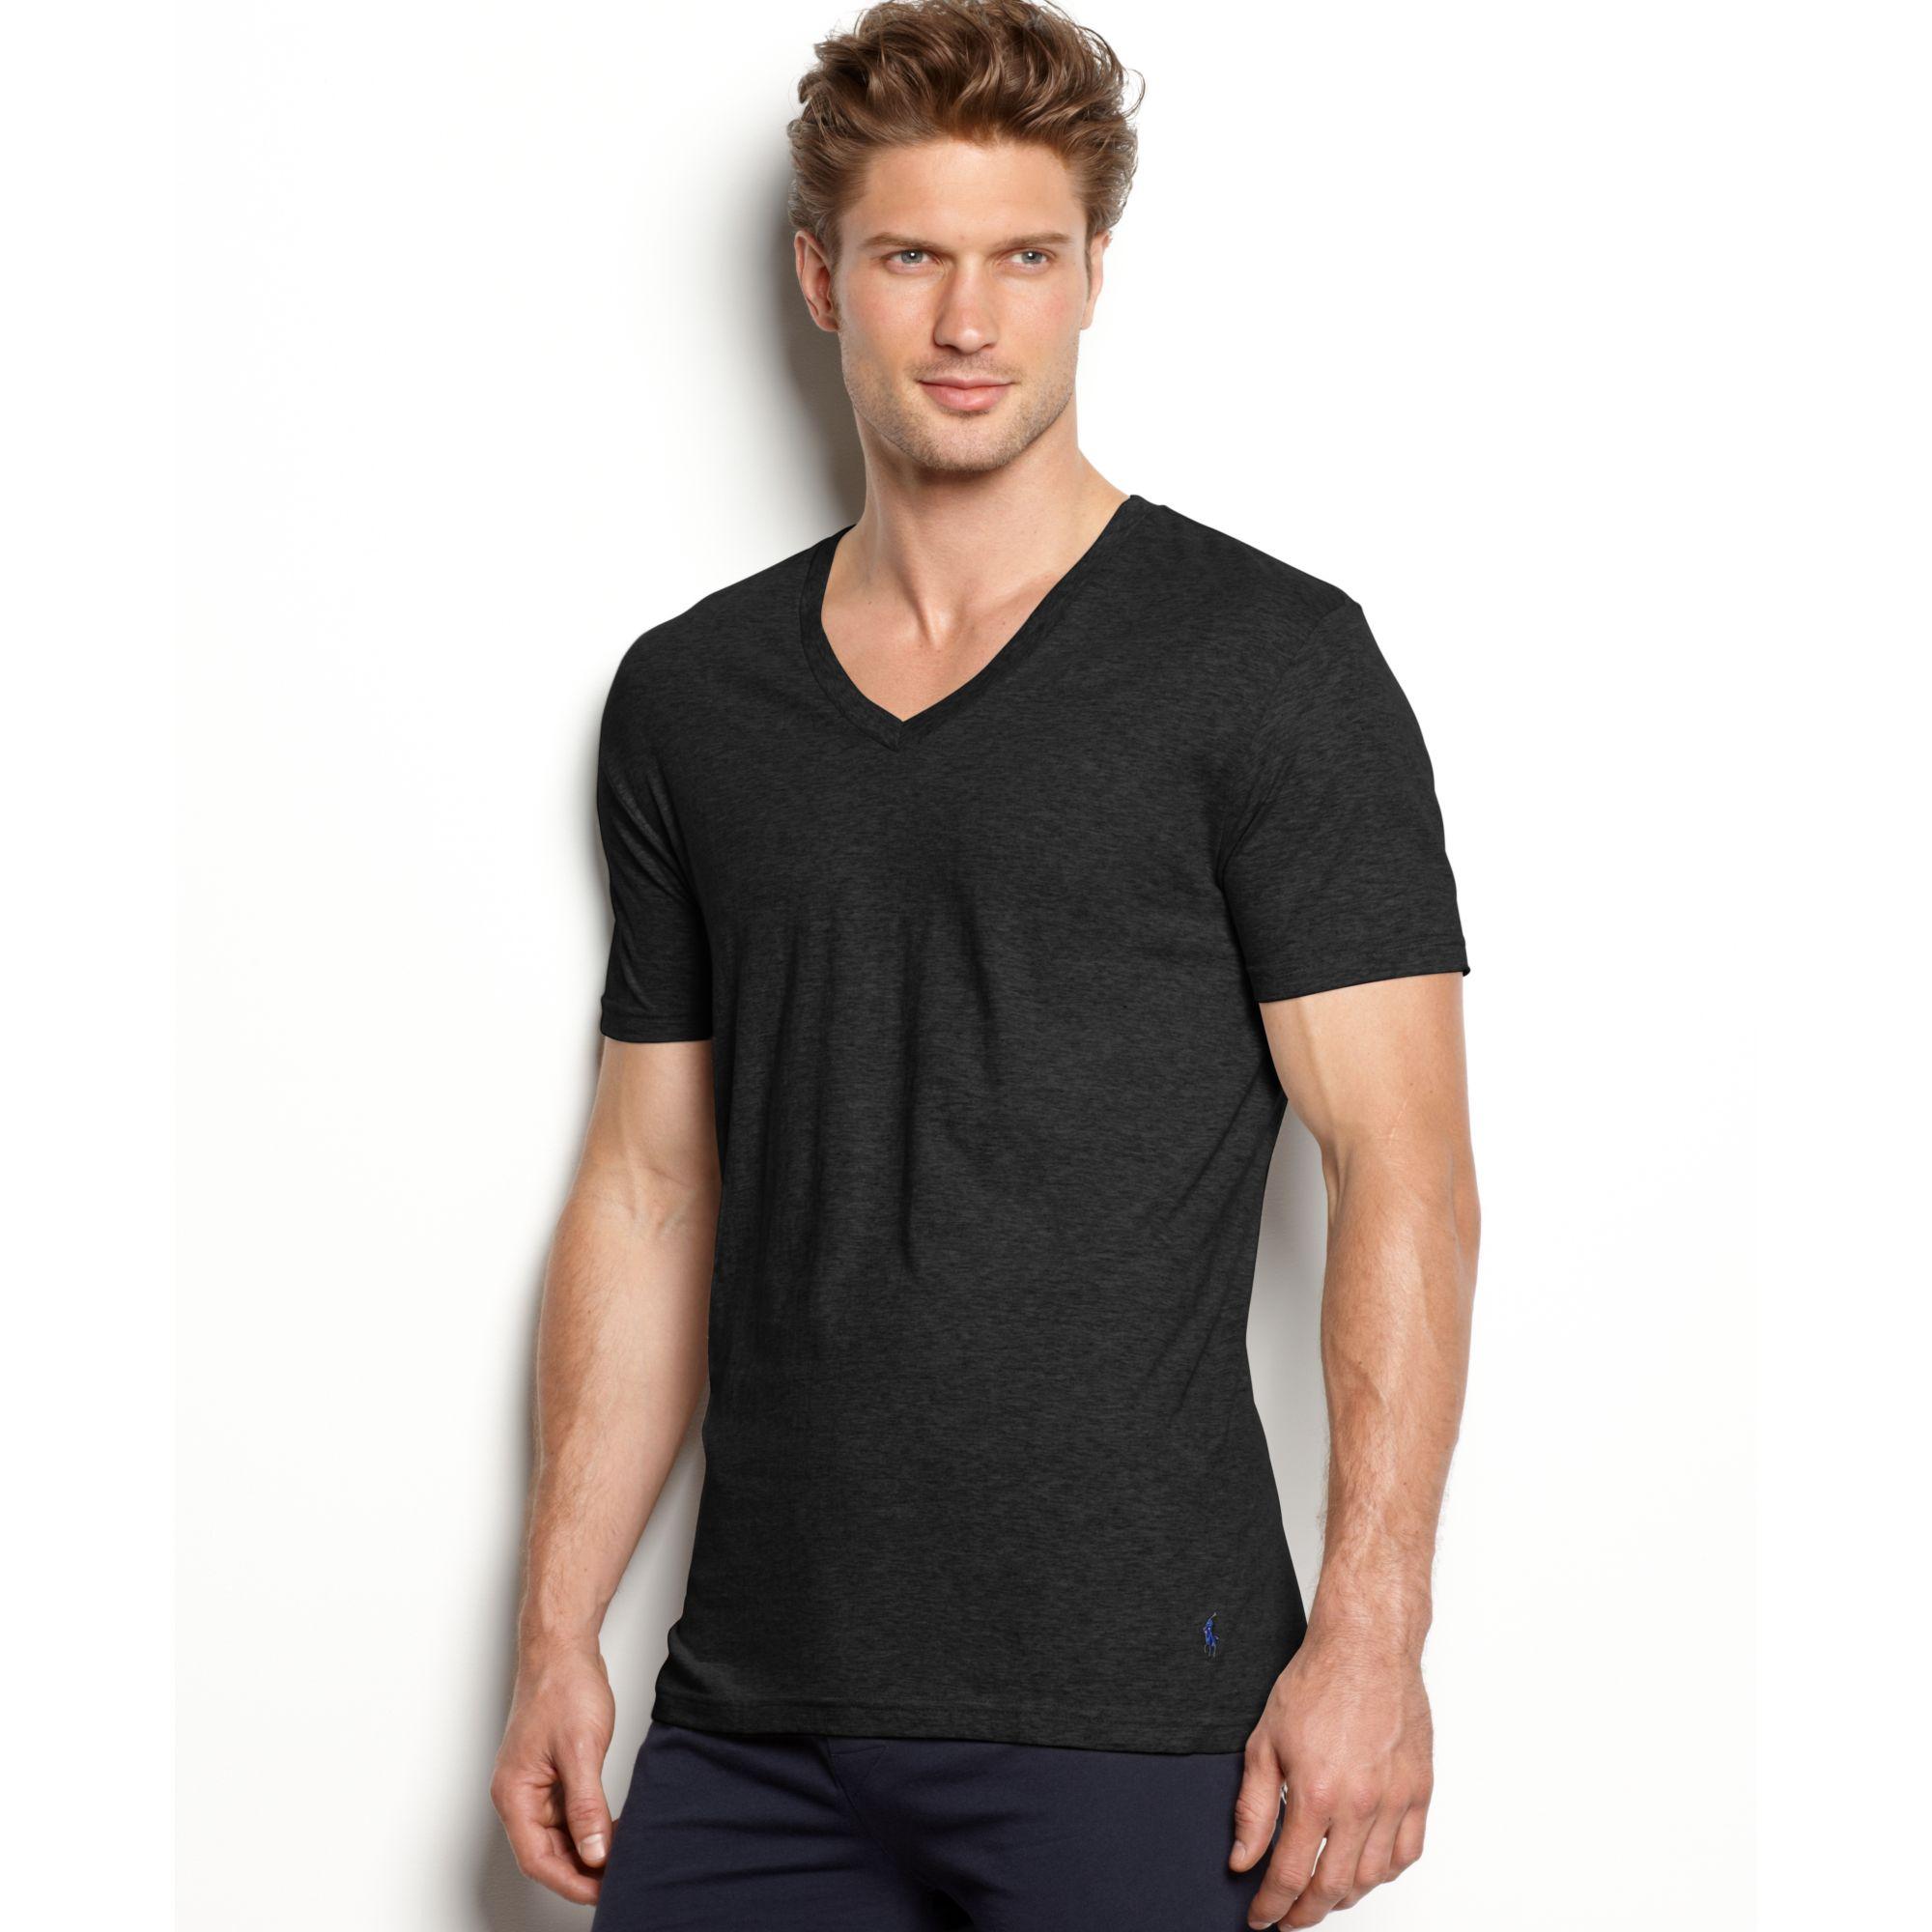 Ralph lauren slim fit stretch v neck t shirt 2 pack in for Slim v neck t shirt